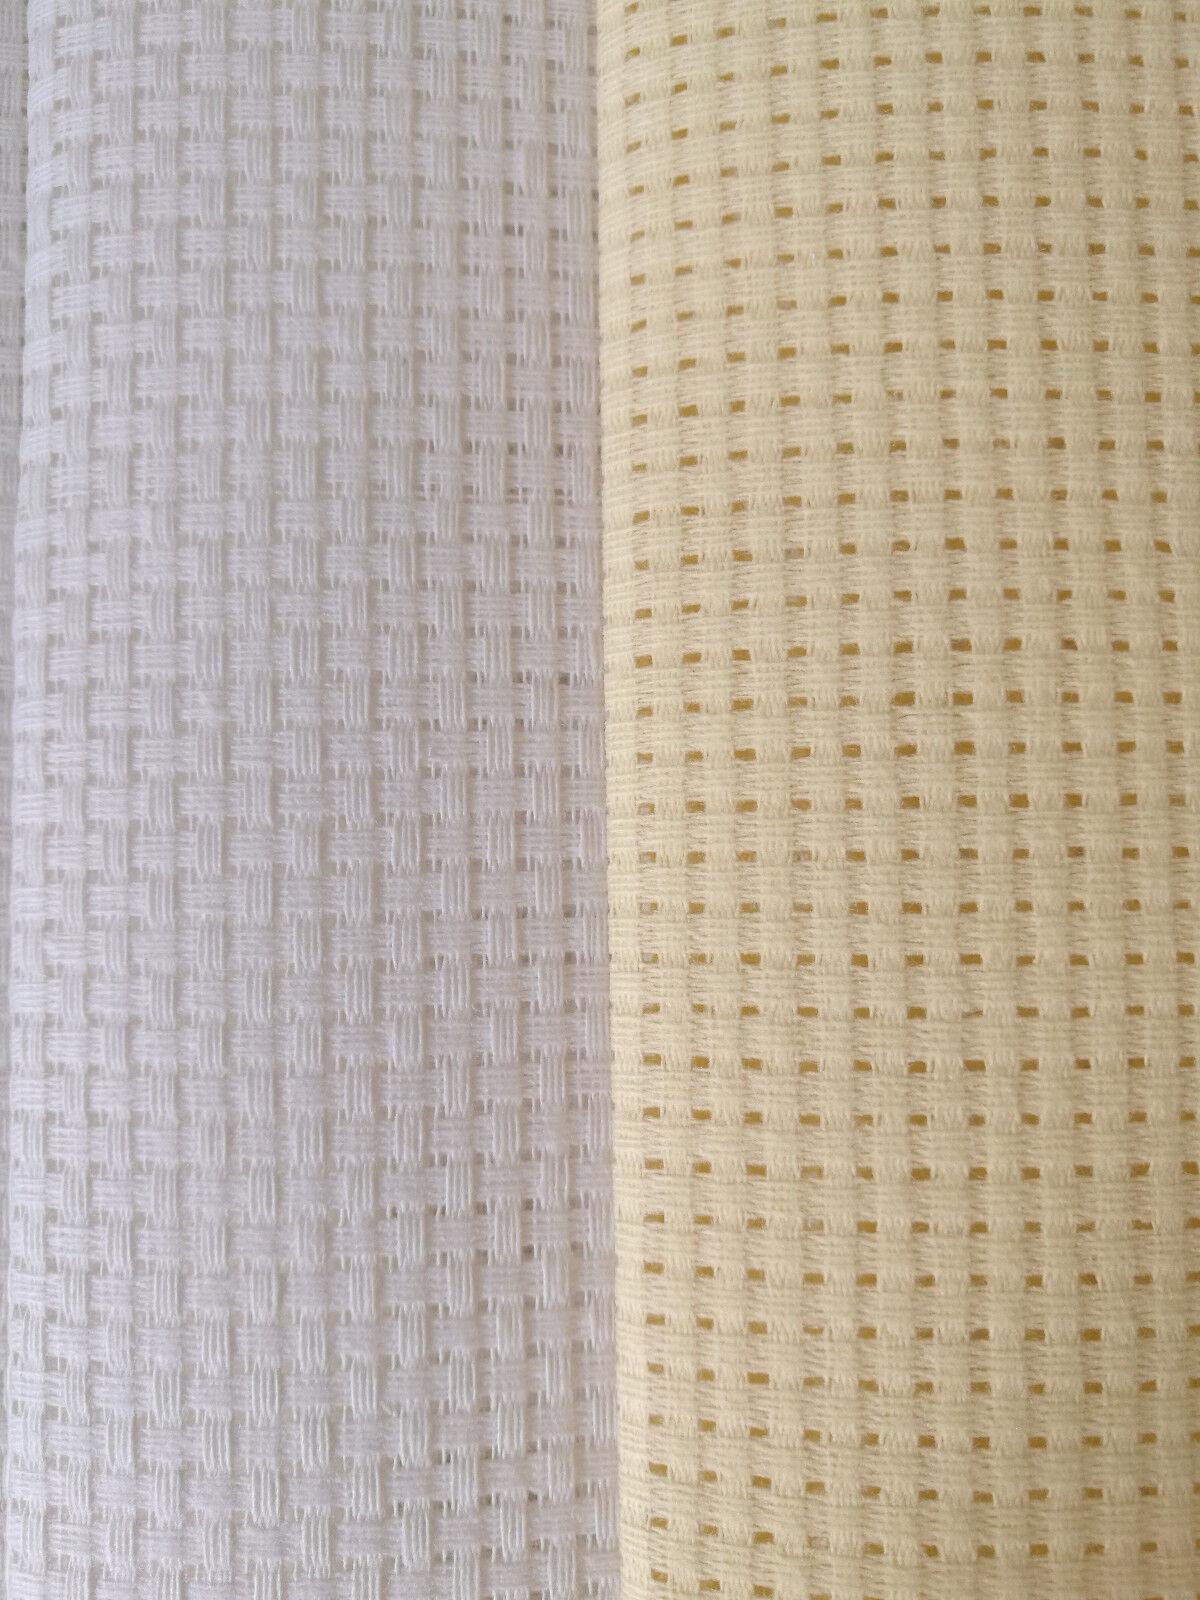 White 3.5 count Turkestan Binca  Aida 100 x 70 cm Zweigart great for cushions